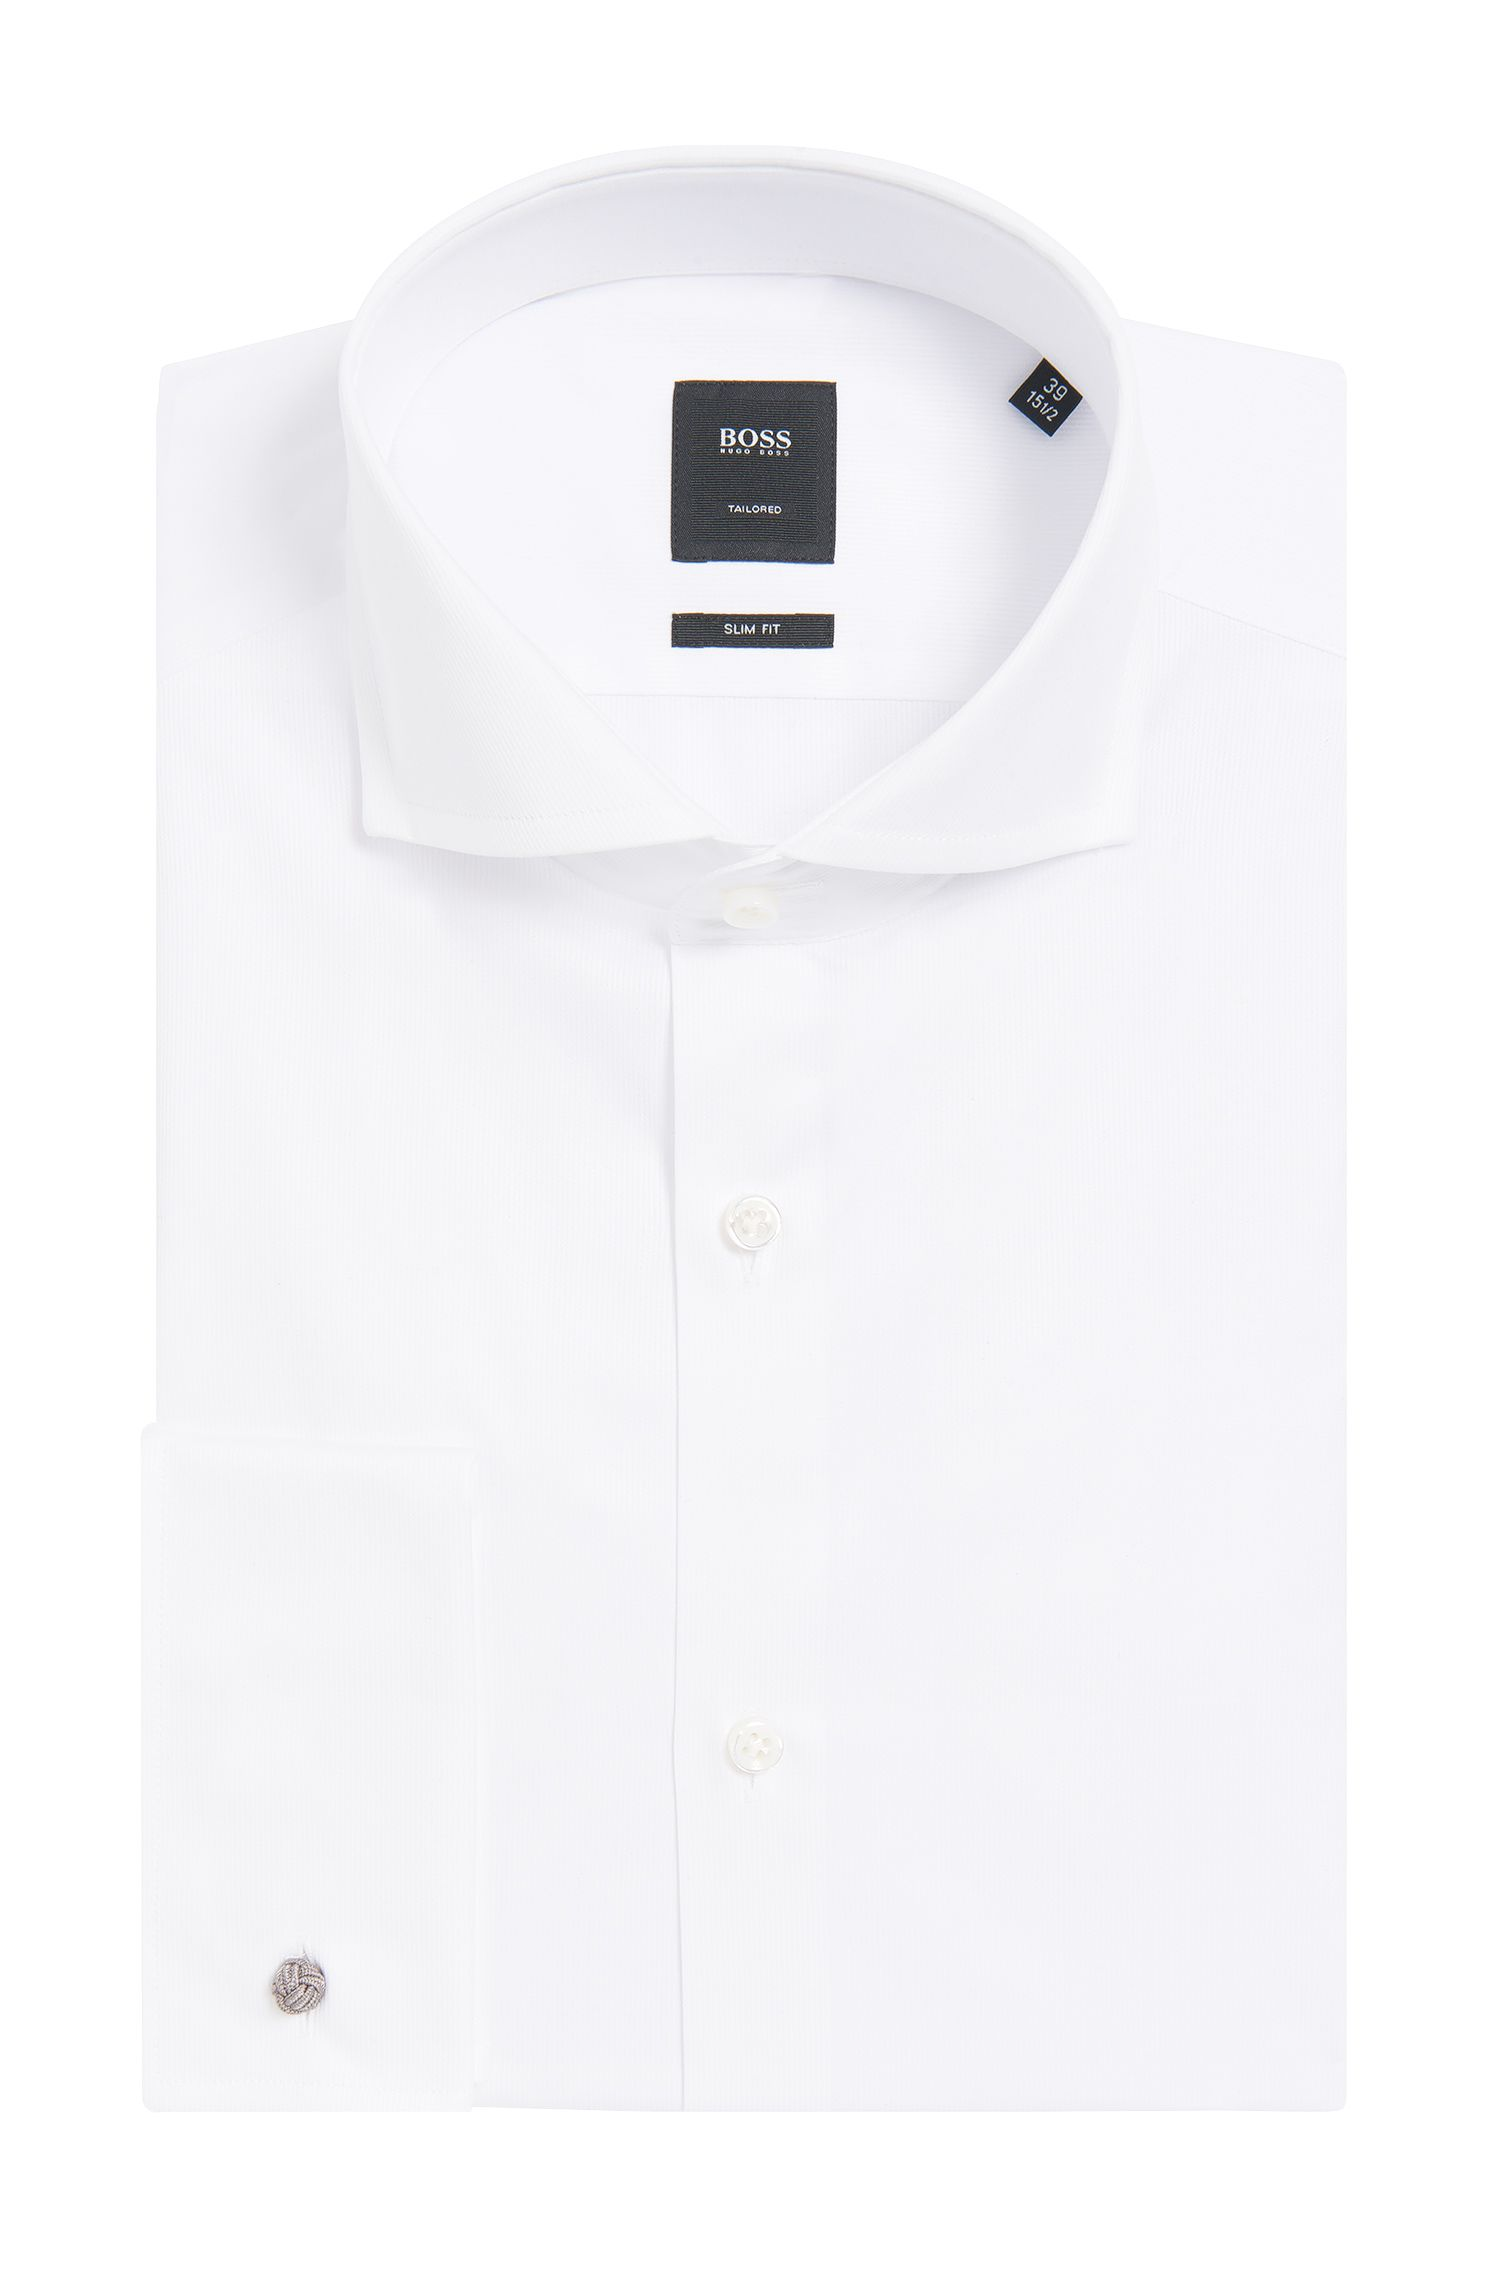 'T-Yacob' | Slim Fit, Italian Cotton French Cuff Dress Shirt